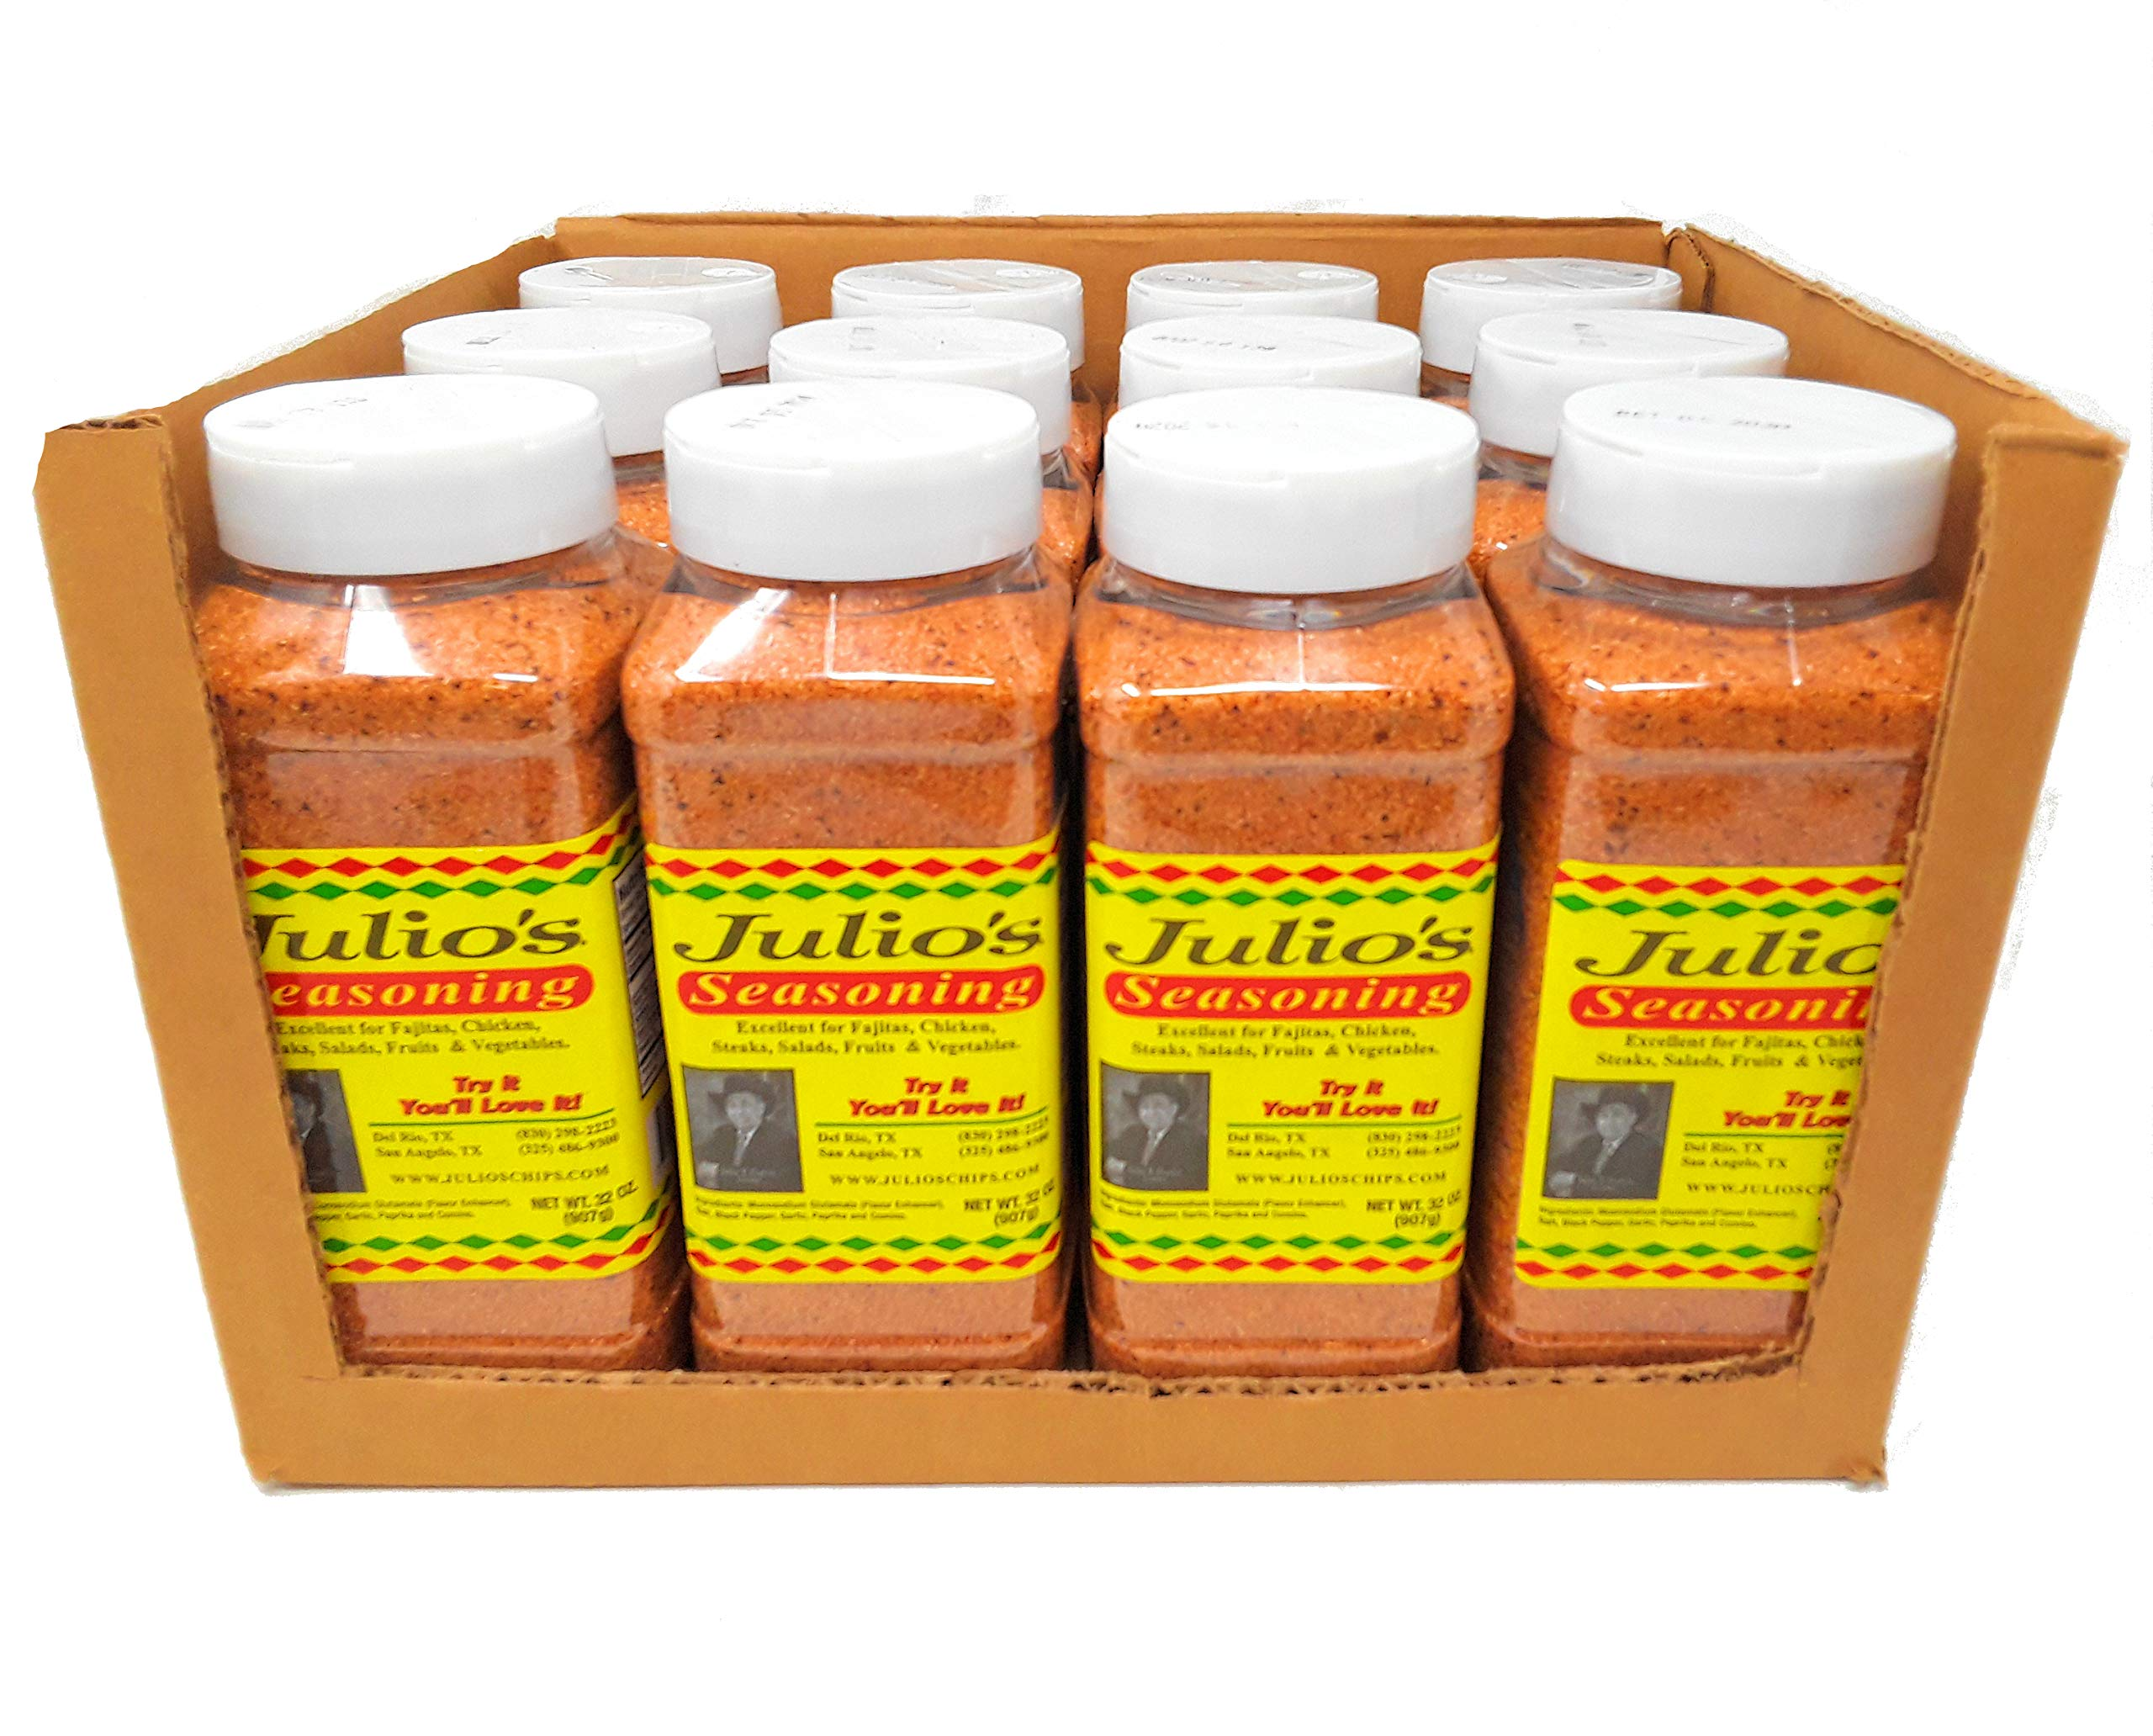 Julio's Seasoning - 32 oz Shaker Bottles, Pack of 12 - Ideal for Restaurants/Food Trucks/Resale - Save Big on Each - Best Seller in Texas - Great Southwestern Tex-Mex Flavor